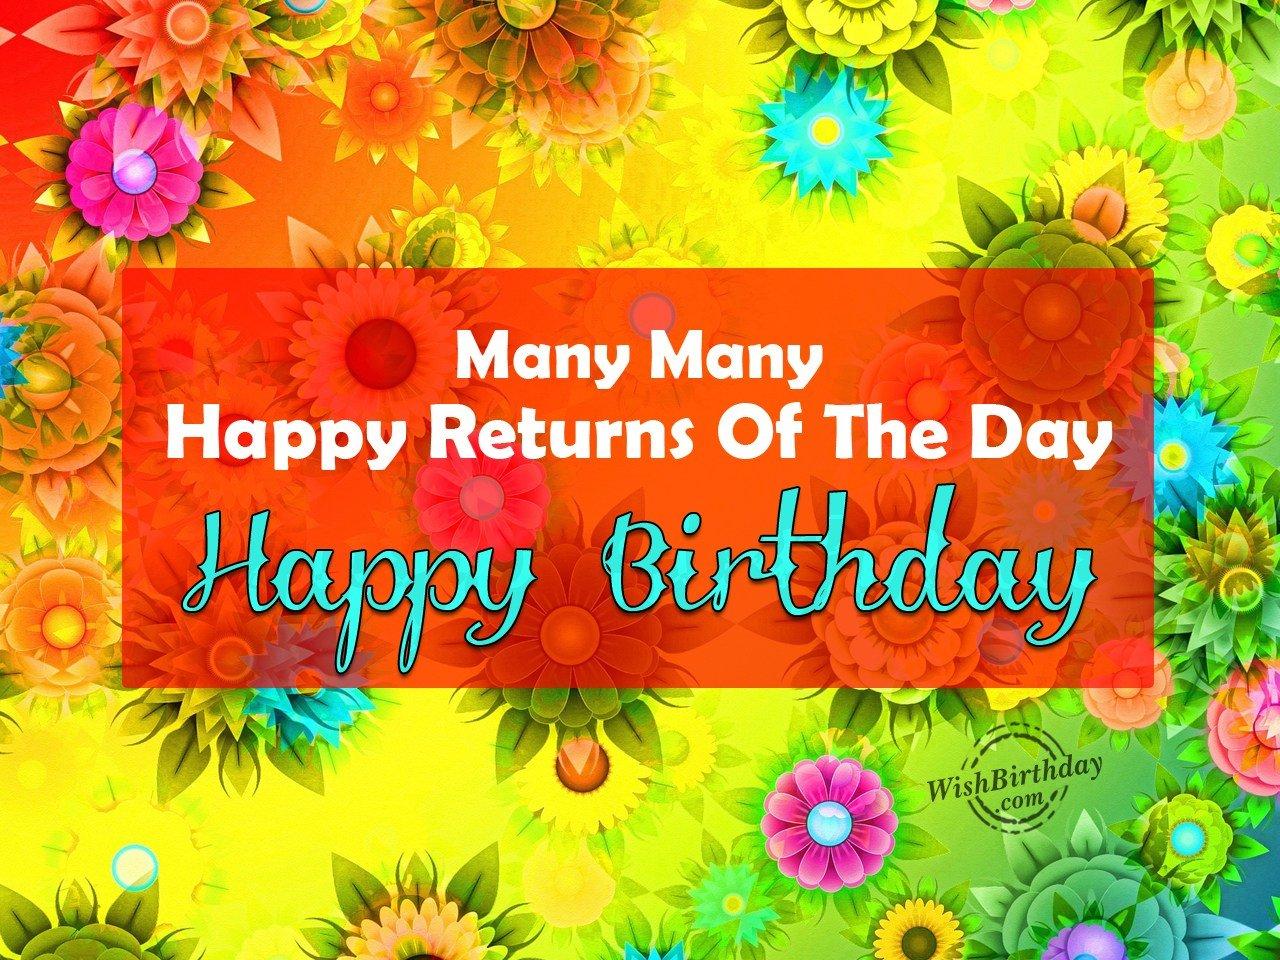 Many Many Happy Returns Of The Day Wishbirthday Com Many More Happy Birthday Wishes